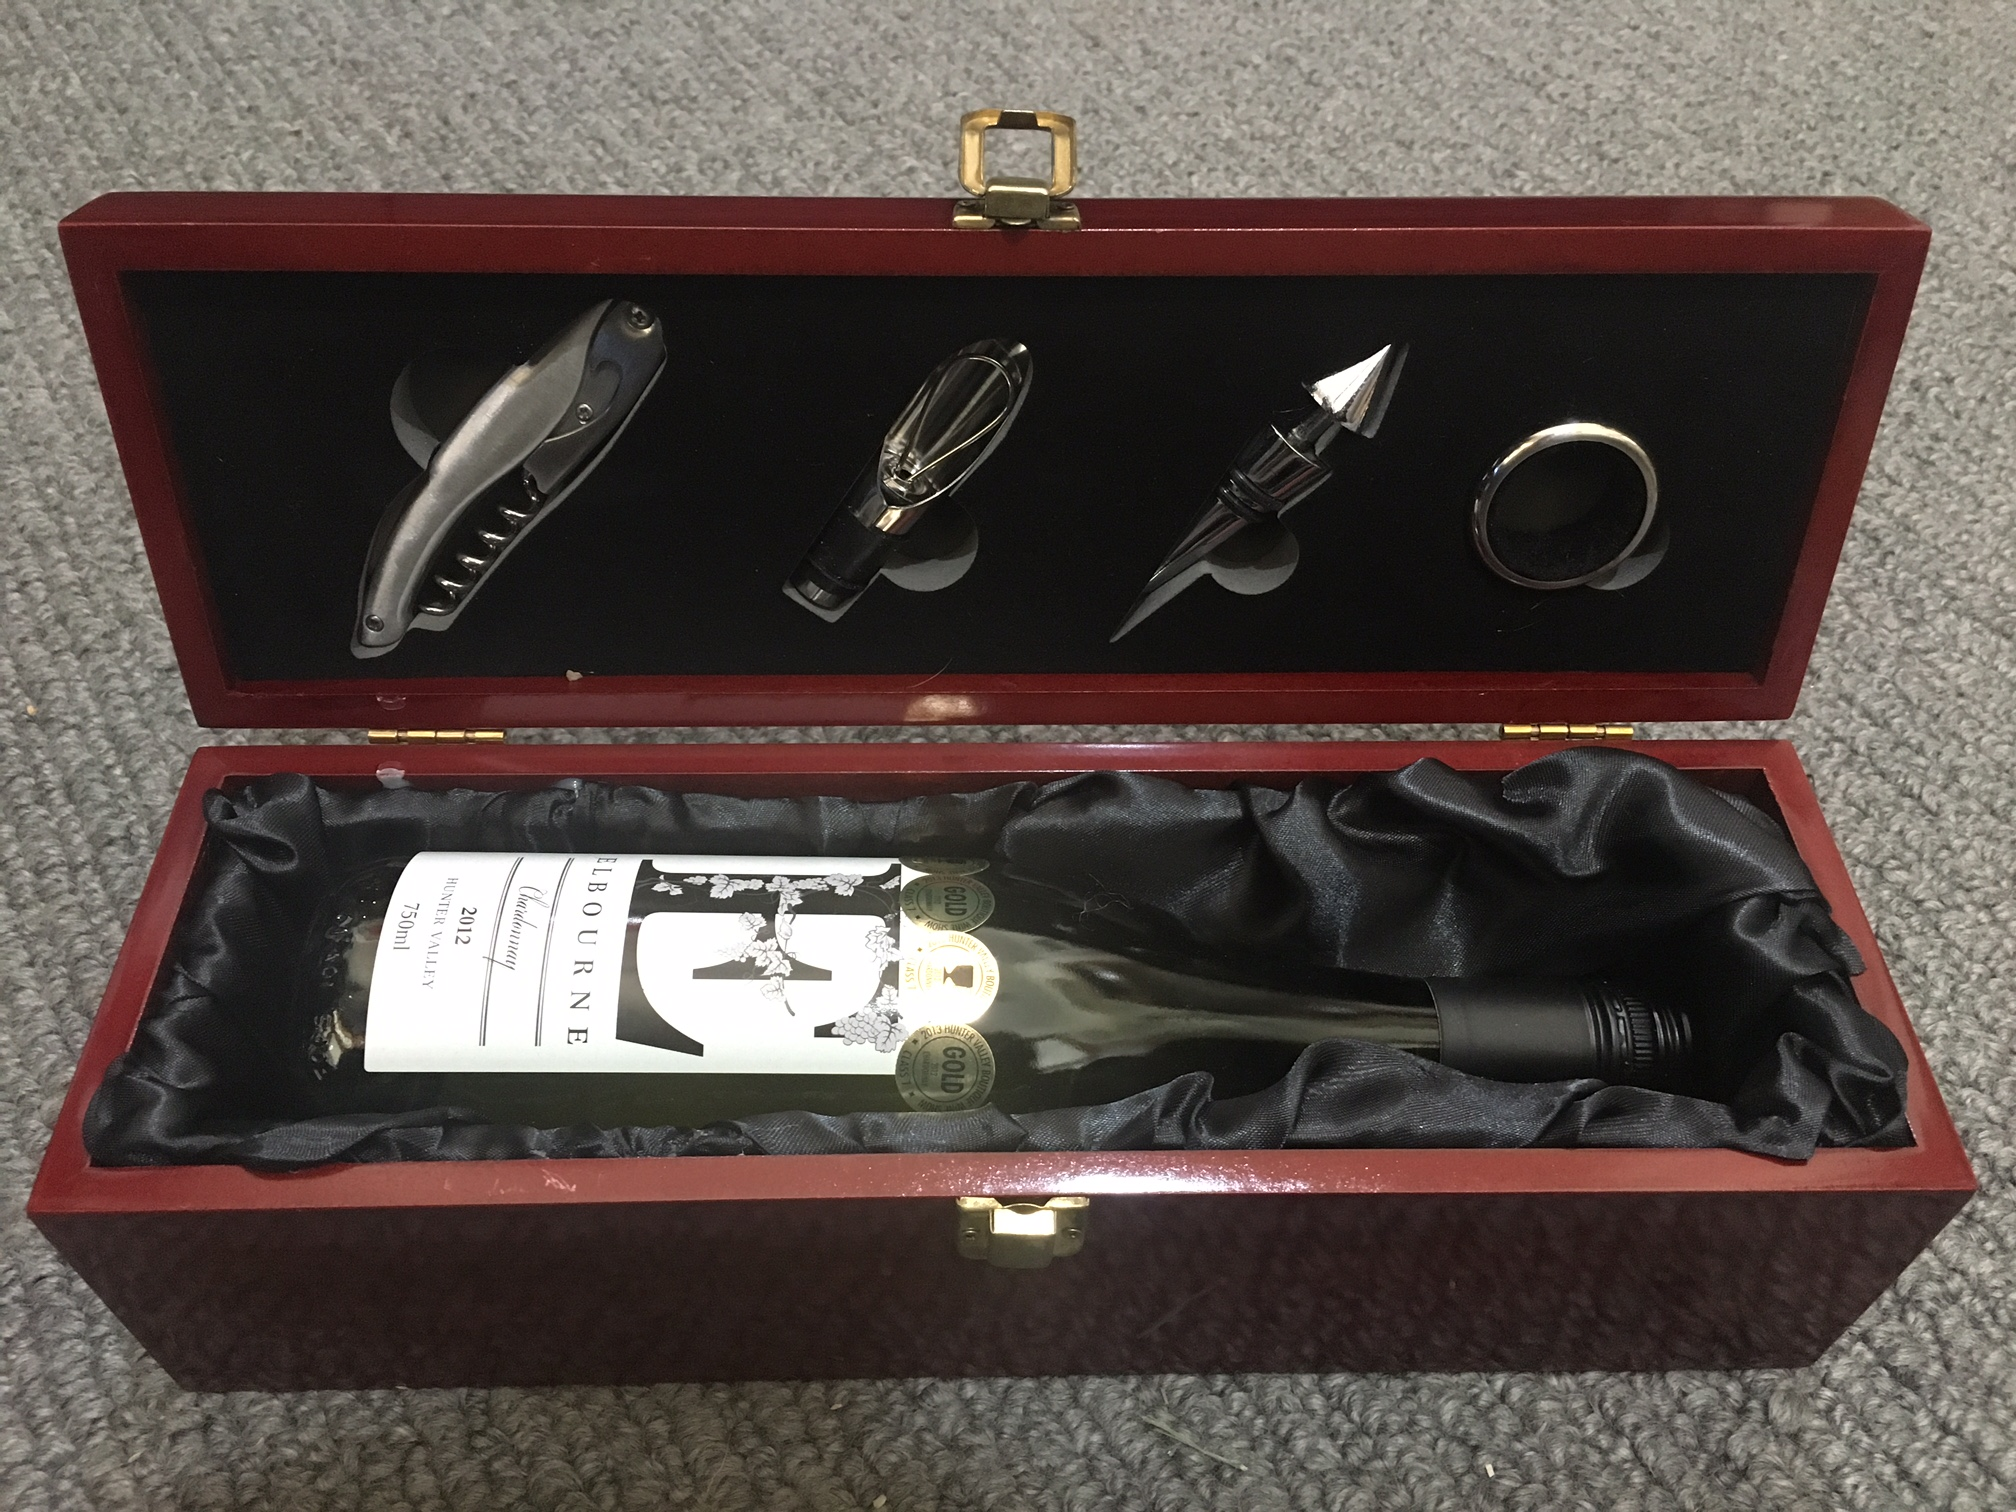 2012 Trophy winning Chardonnay collectors box set